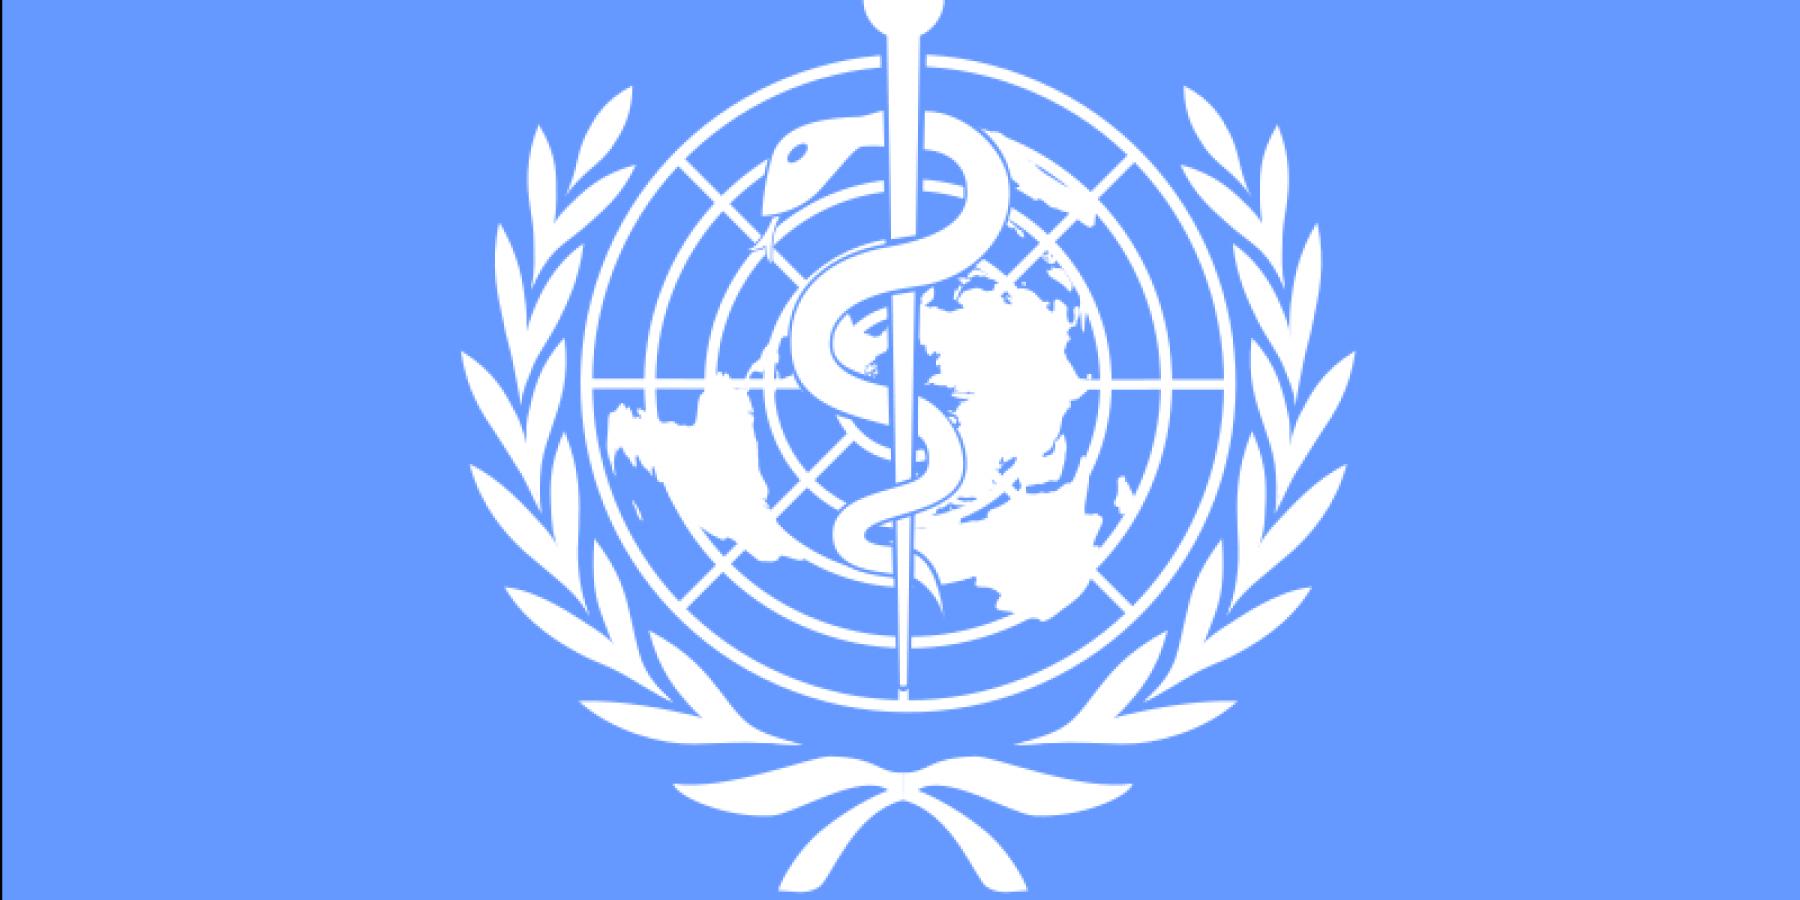 WHO backs AstraZeneca COVID vaccine amid clotting concerns